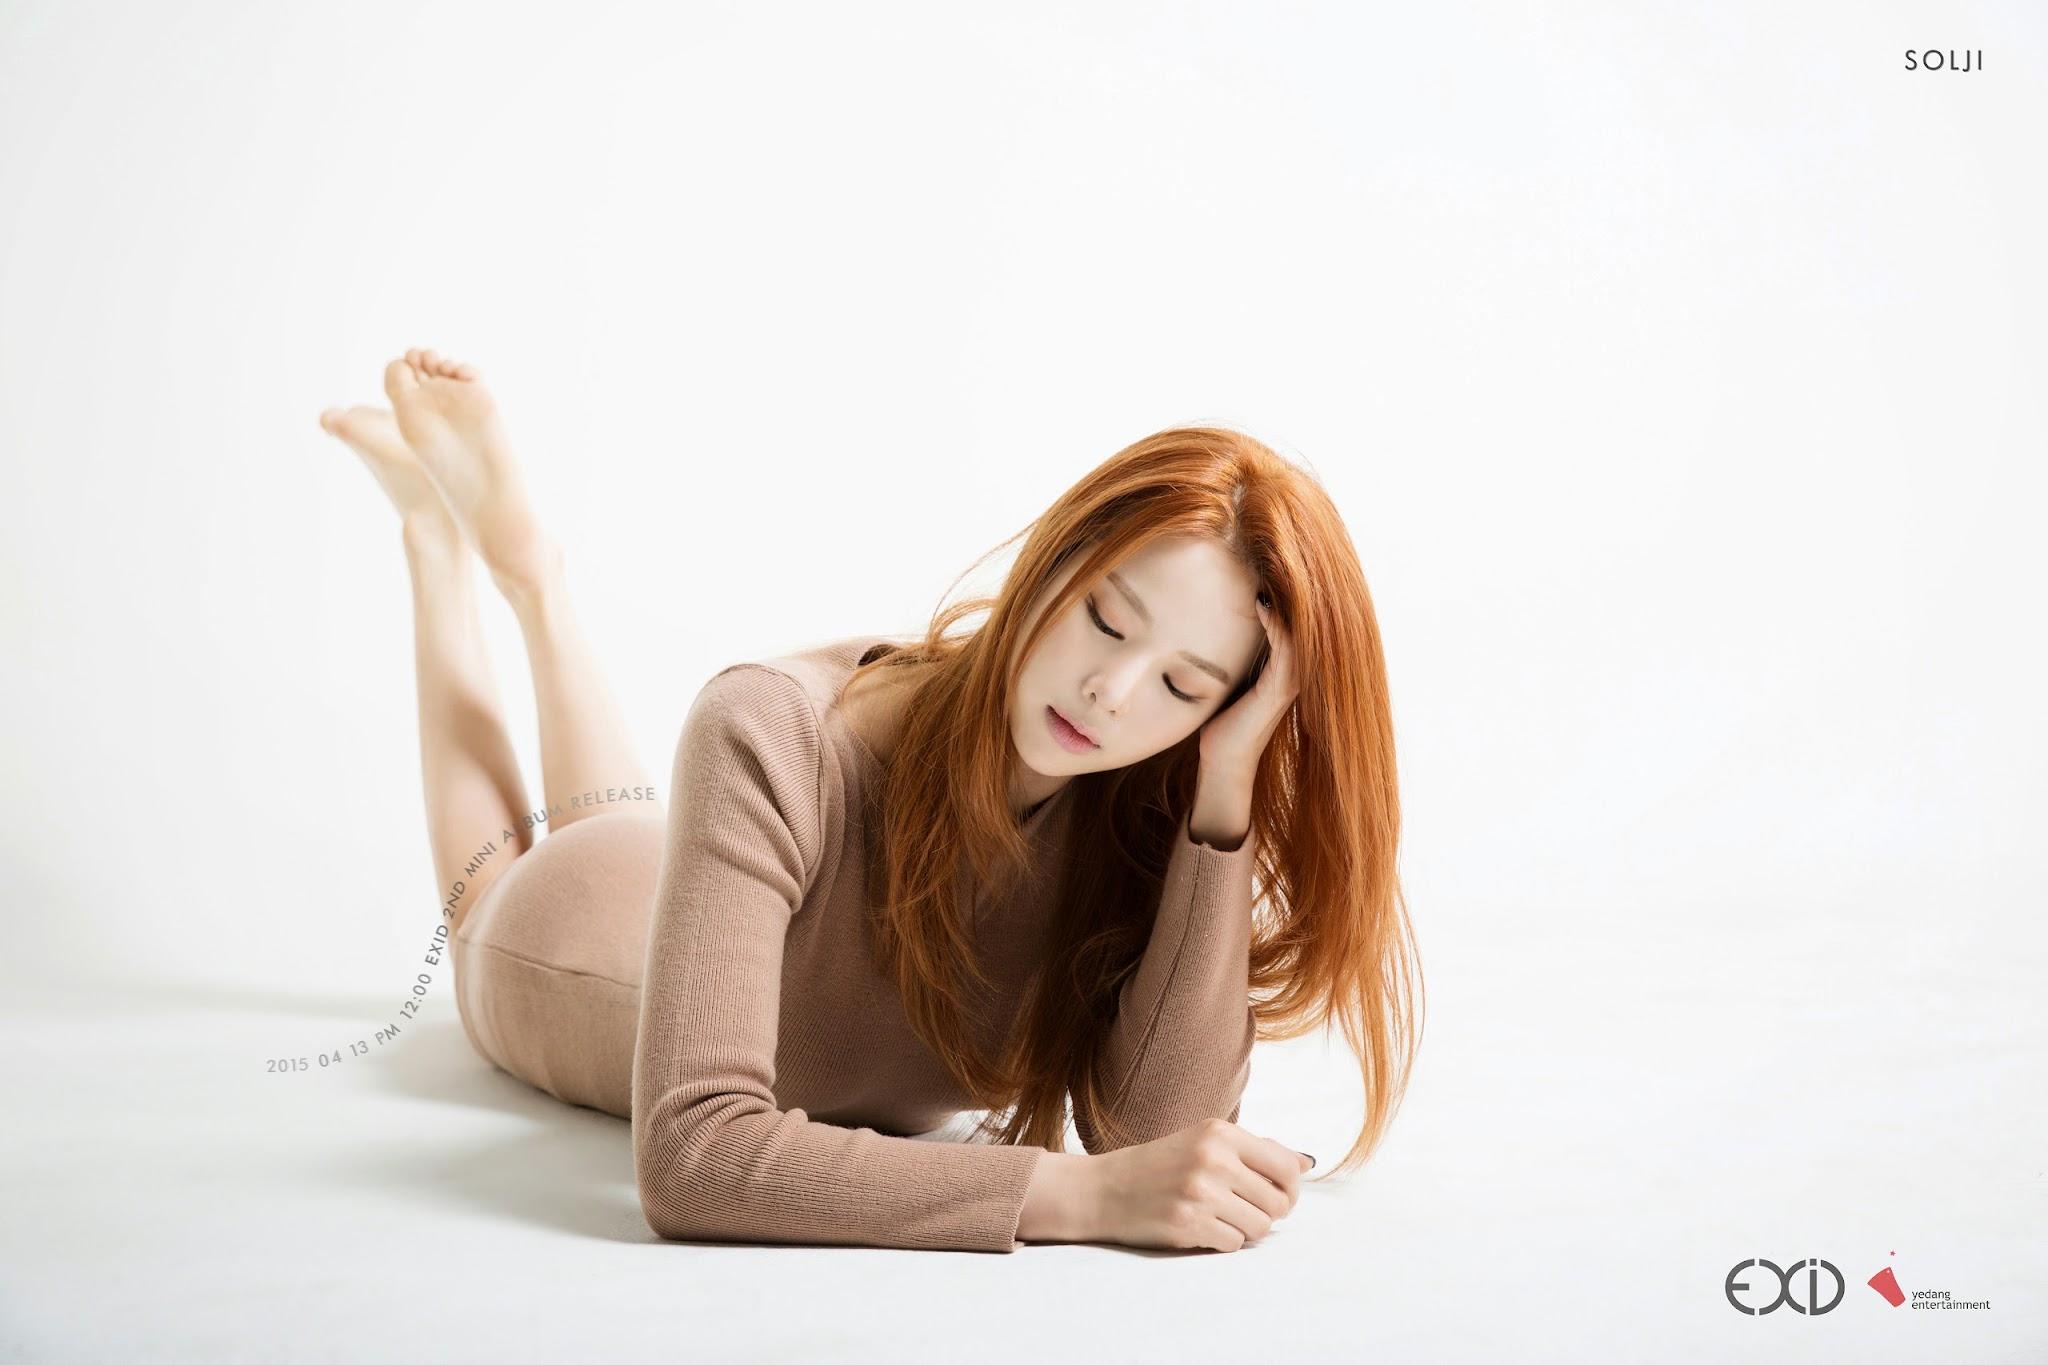 EXID Solji Ah Yeah Teaser